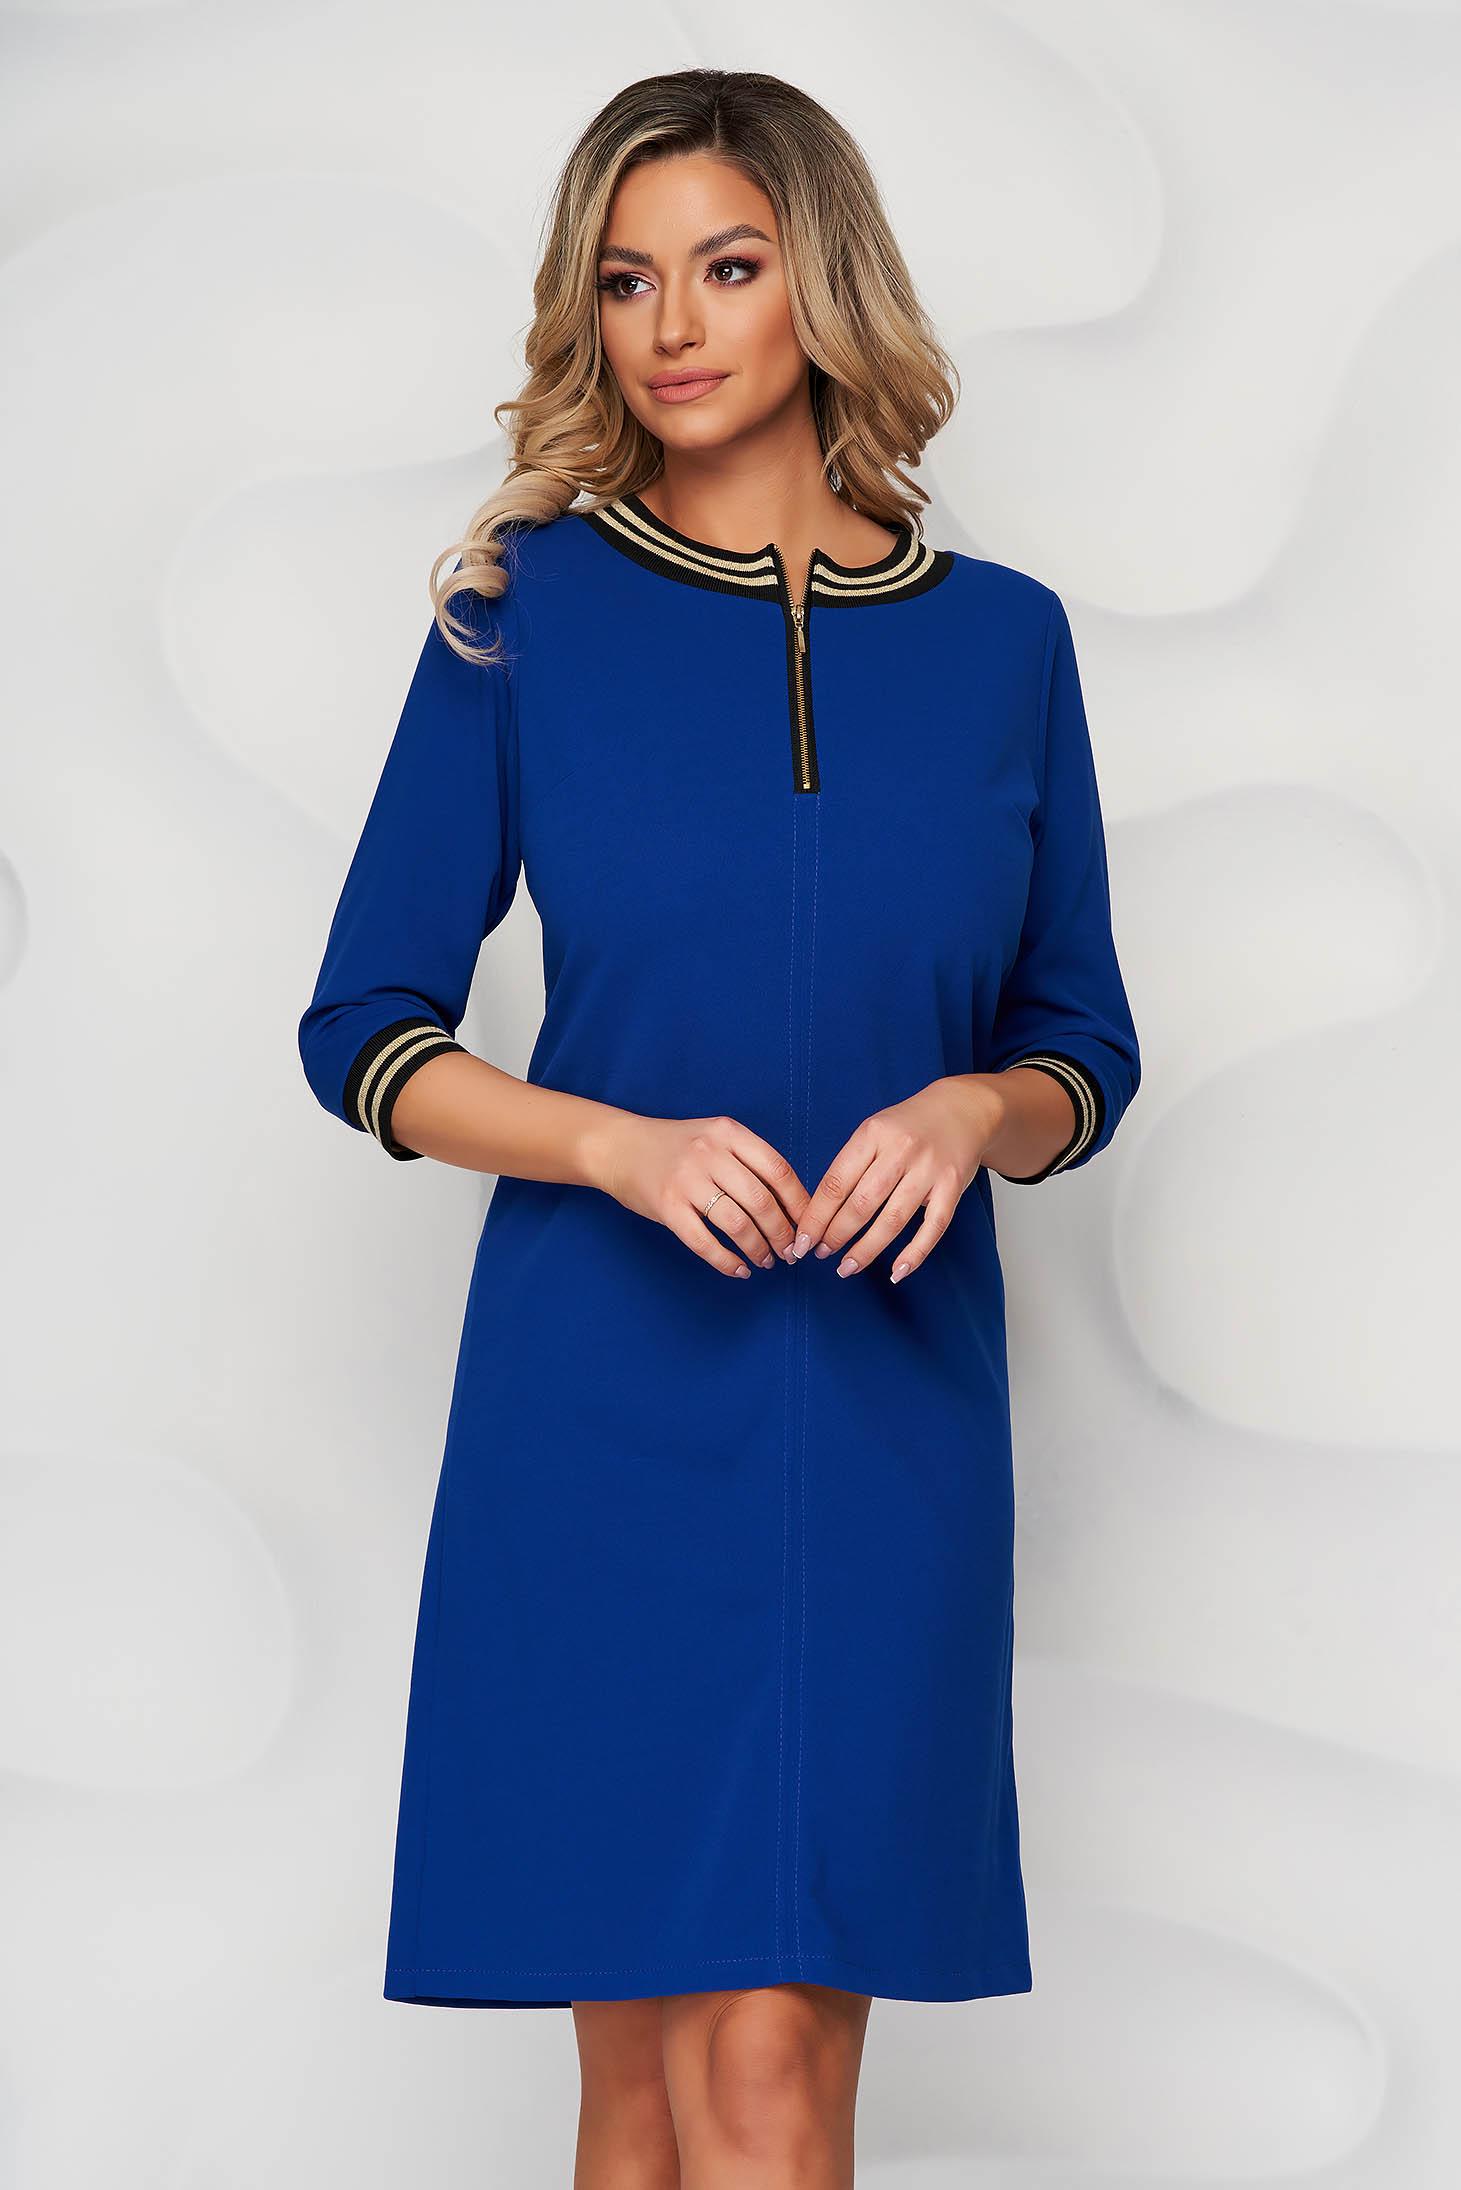 StarShinerS blue dress a-line cloth zipper accessory short cut elegant